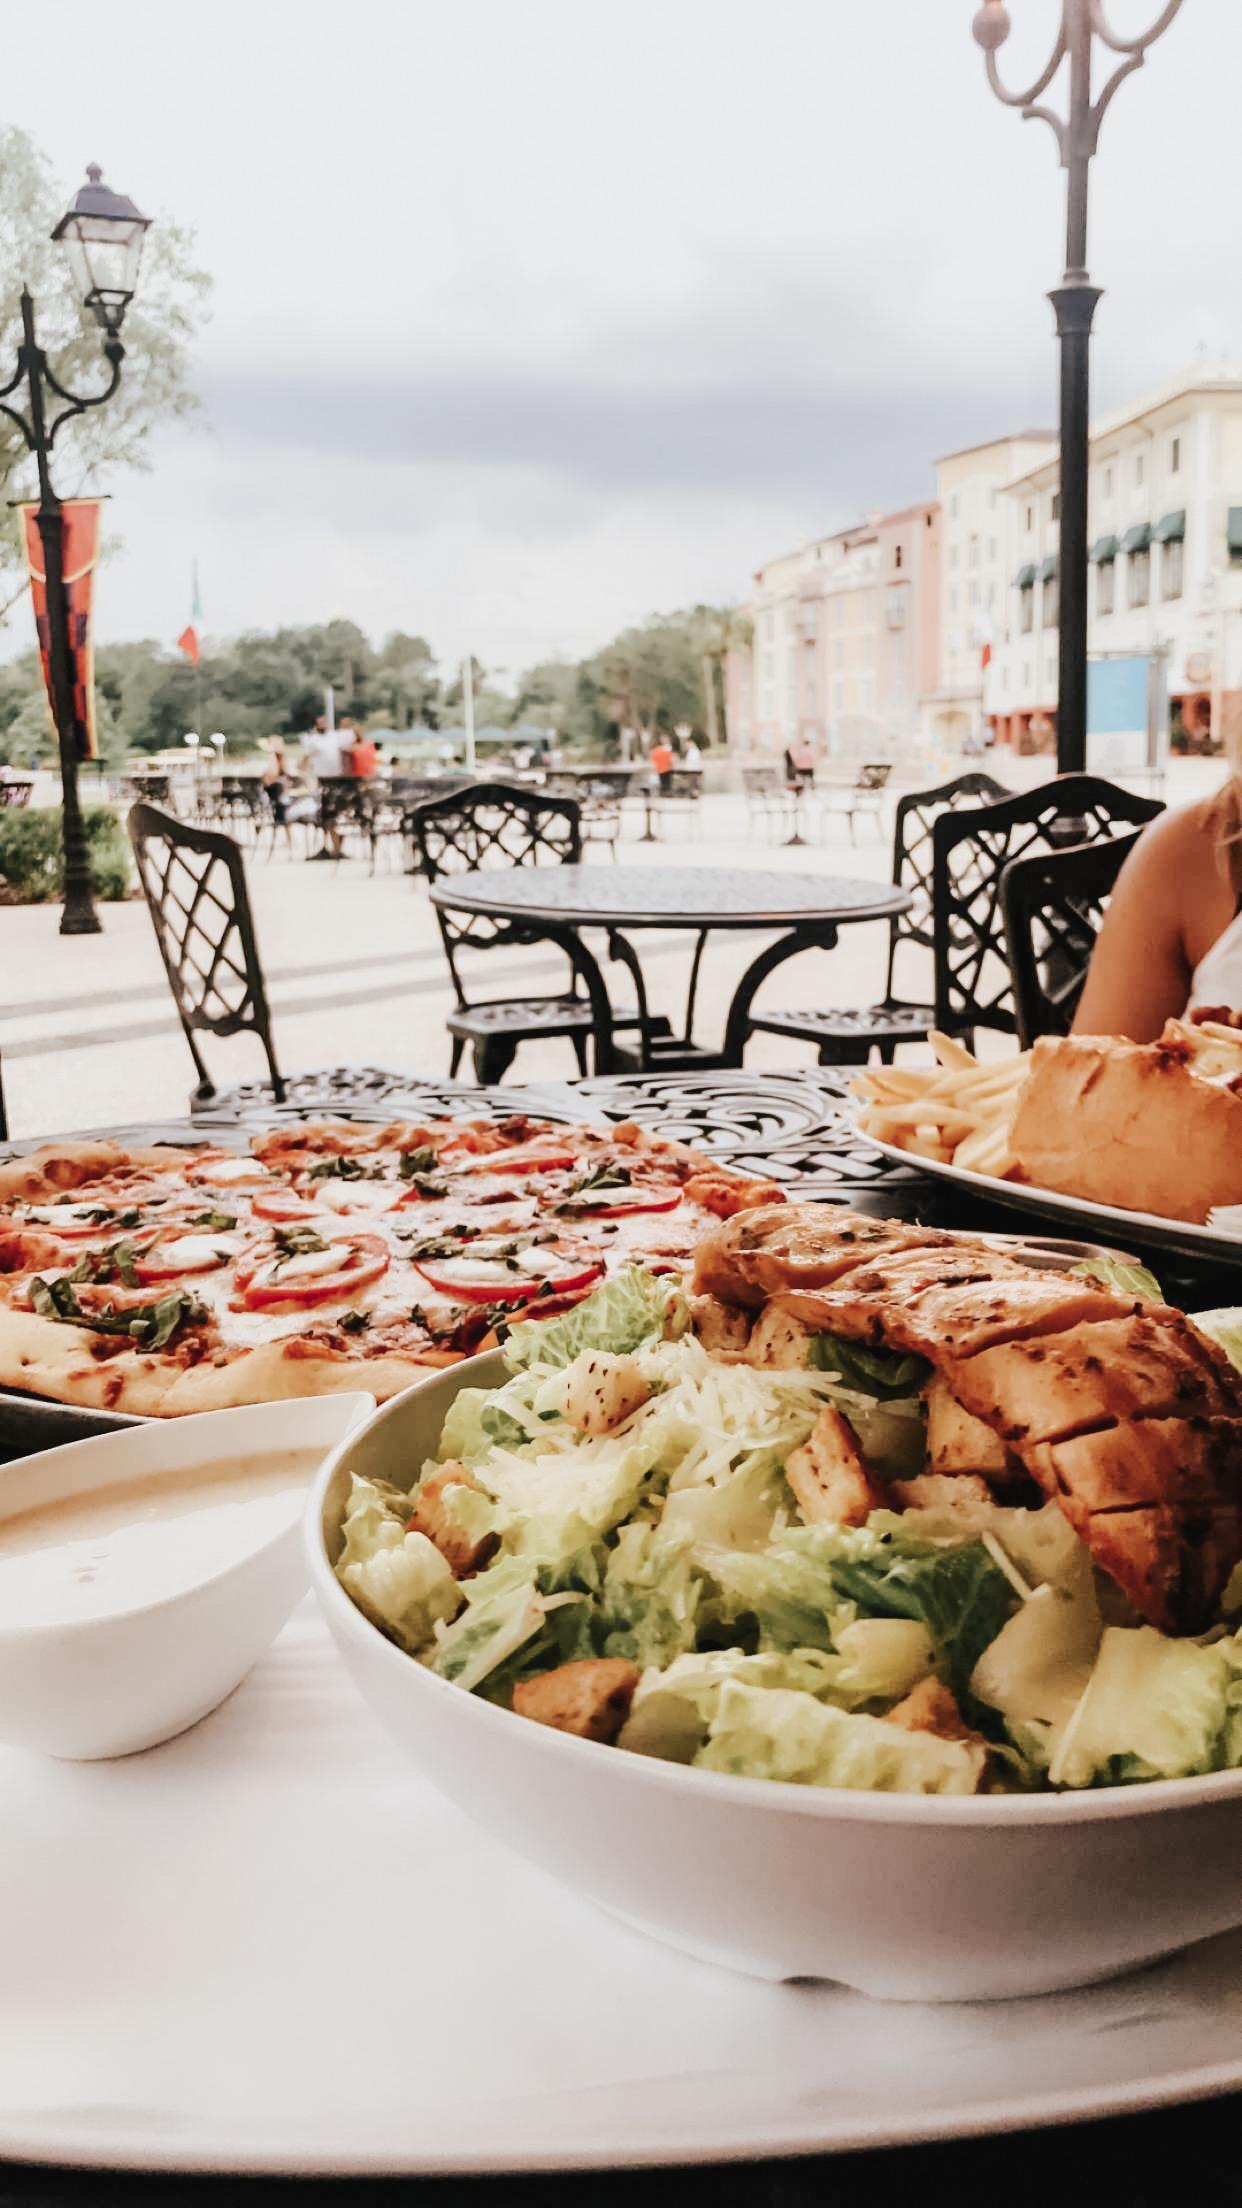 Sals-Market-deli-exterior-Stephanie-Pernas